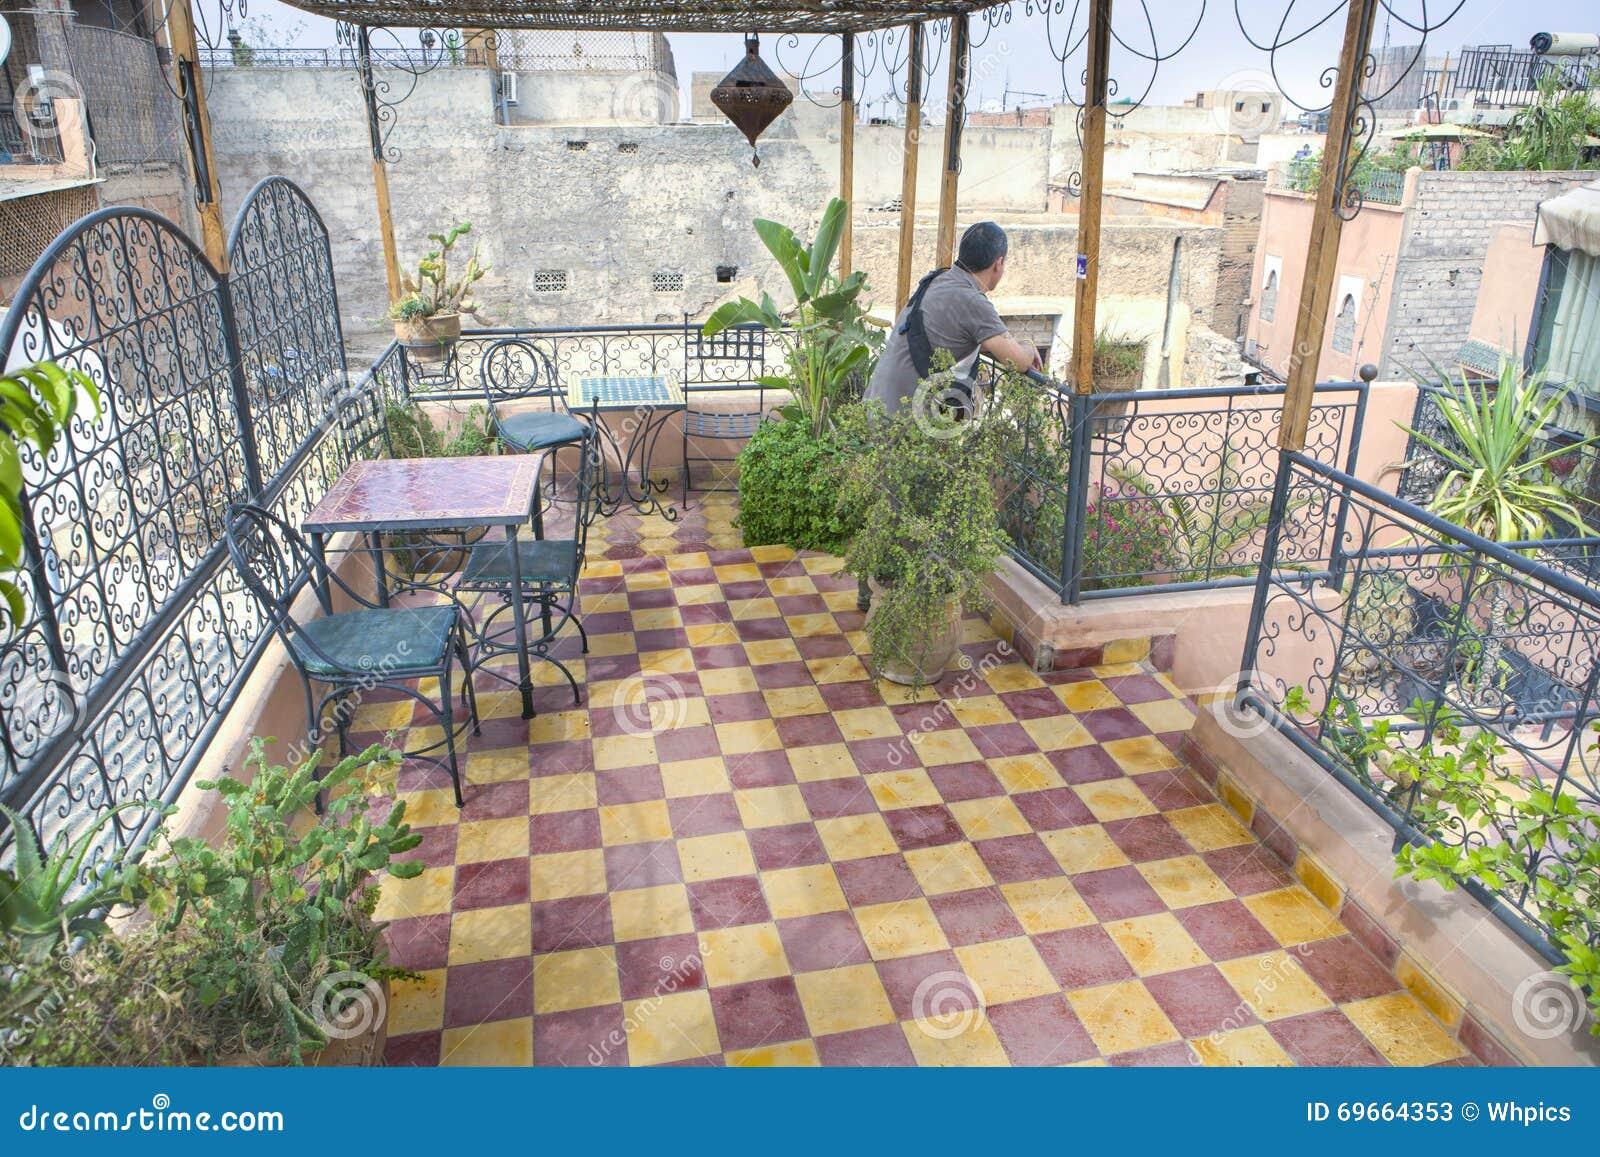 Marokkaans terras marakech stock afbeelding afbeelding 69664353 - Tuin marokkaans terras ...